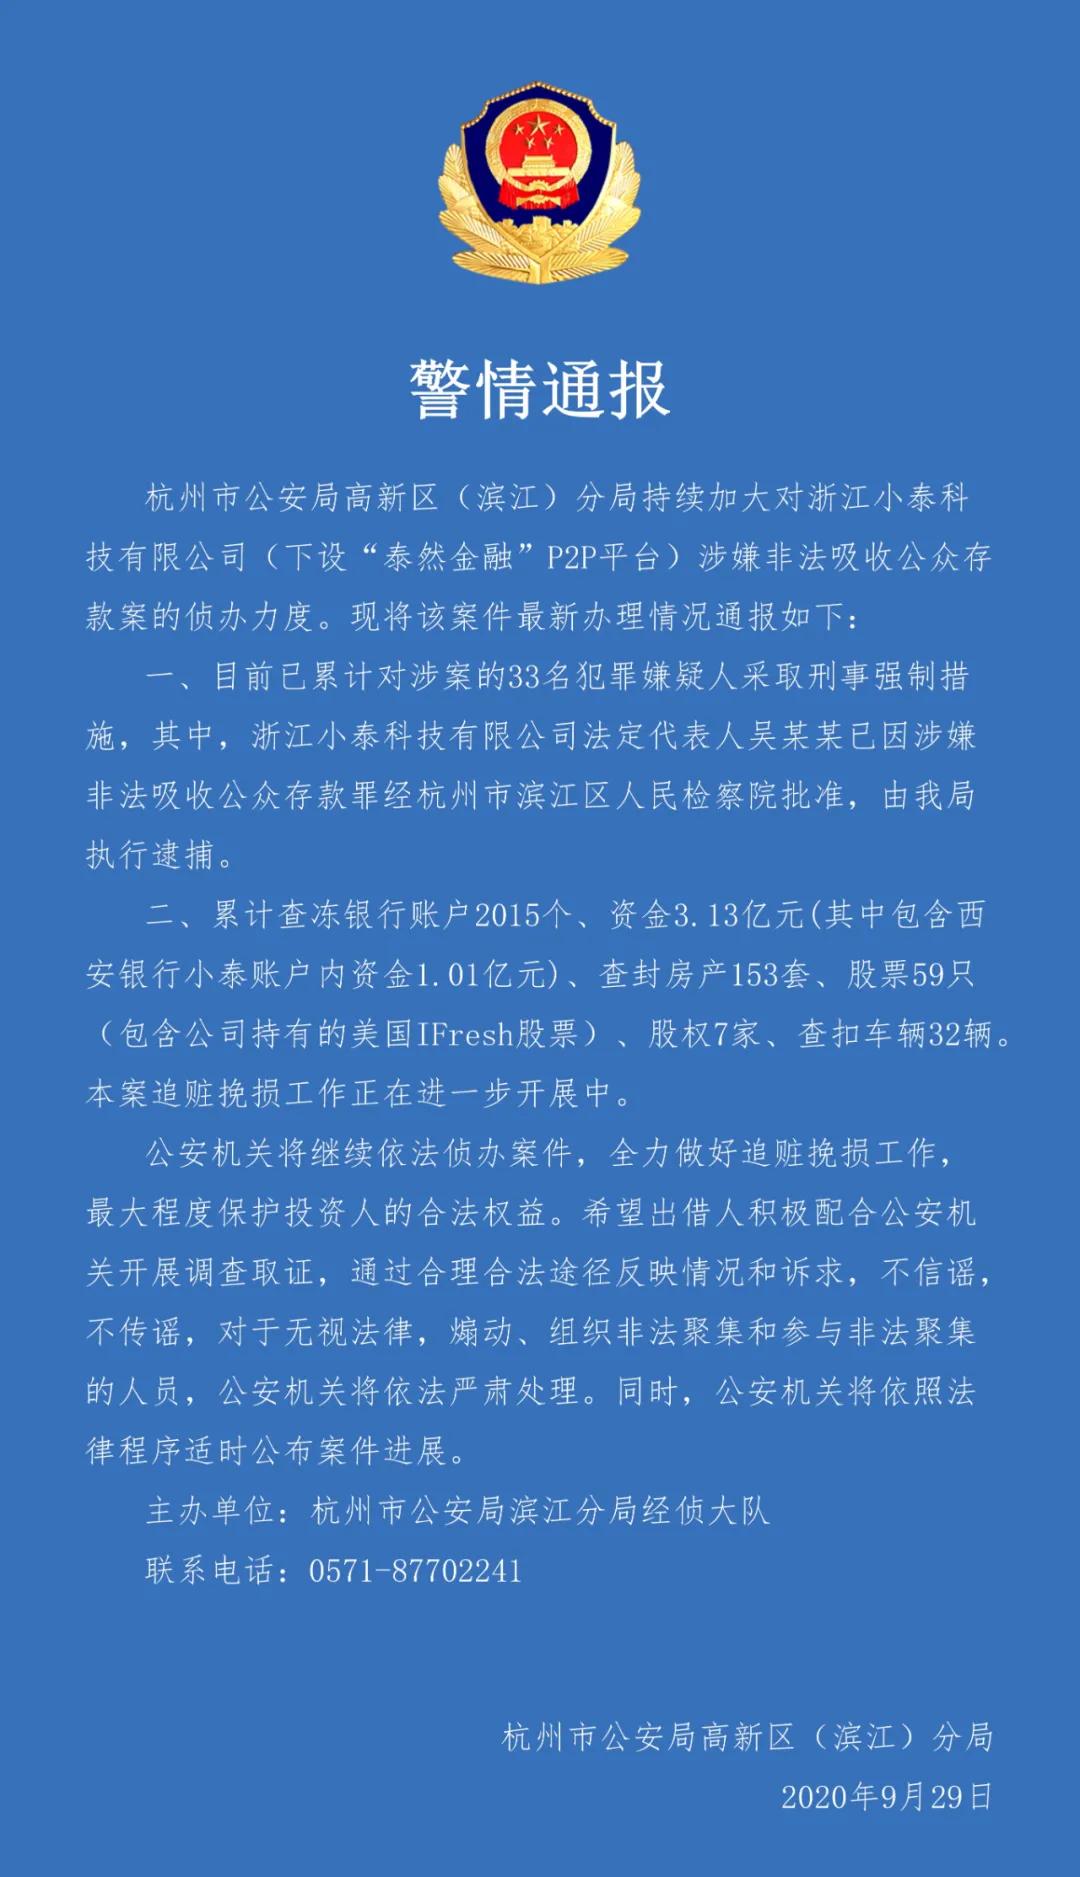 QQ图片20201002123750.png